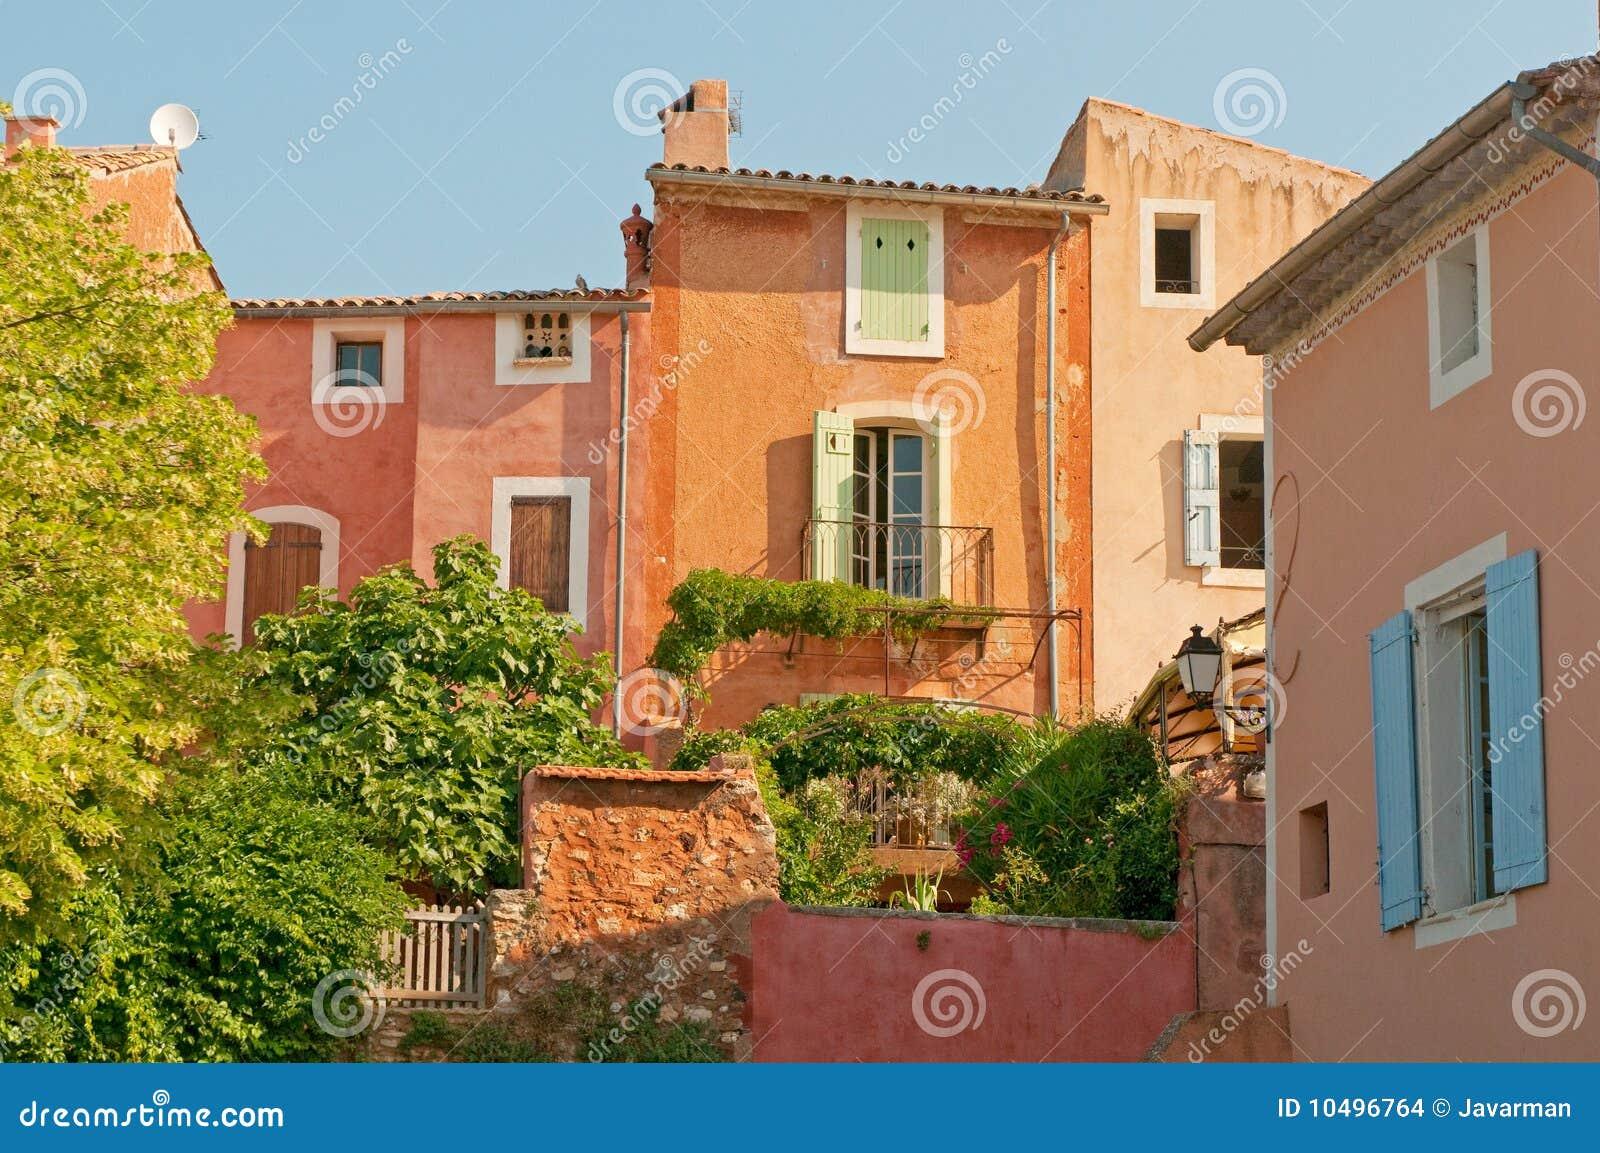 Provencal village of Roussillon